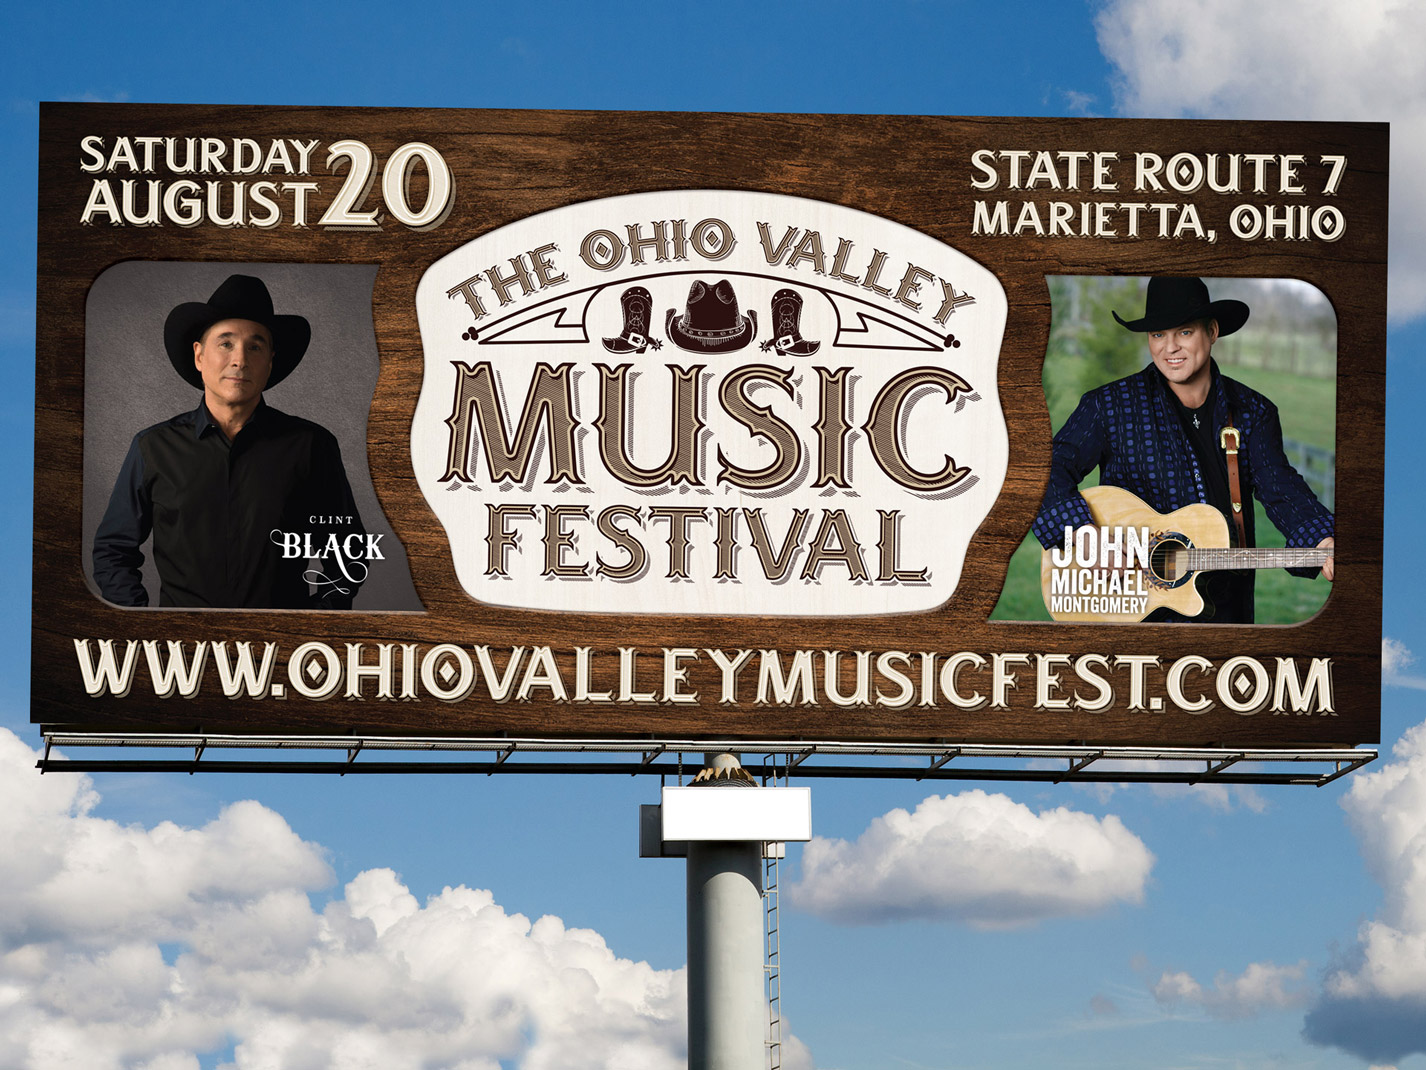 The Ohio Valley Music Festival Branding